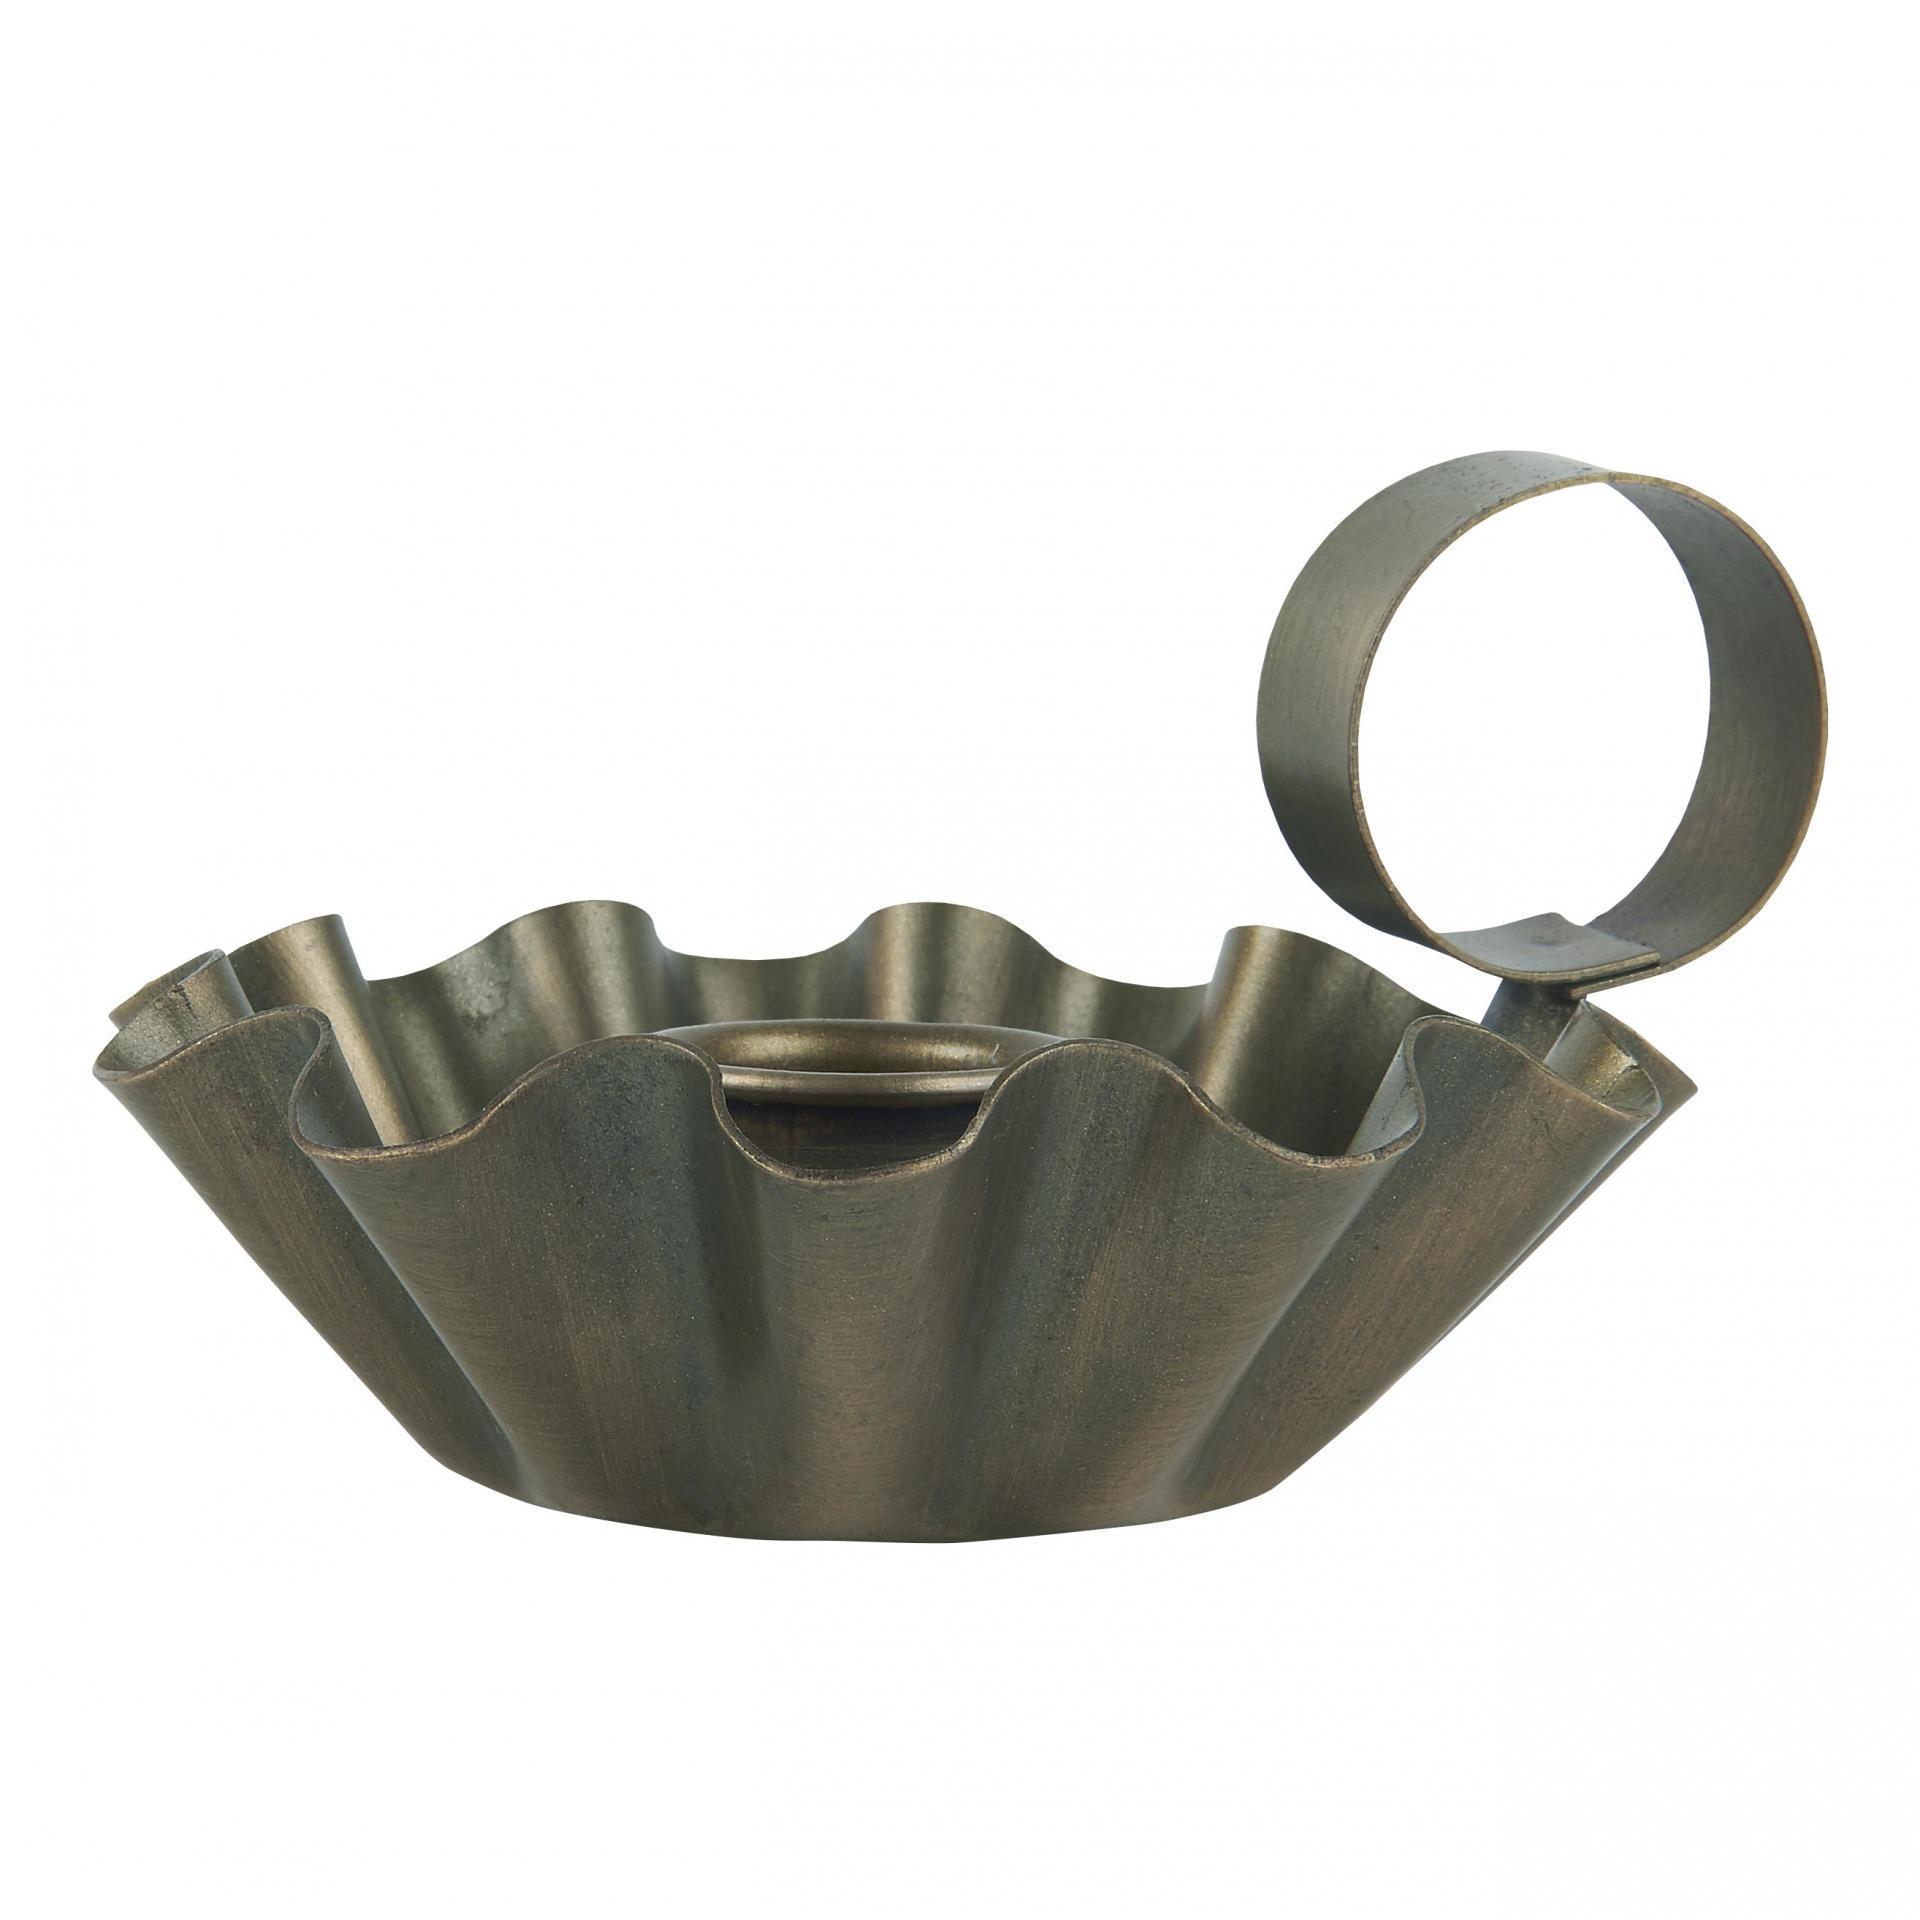 IB-bougeoir-tartelette-laiton